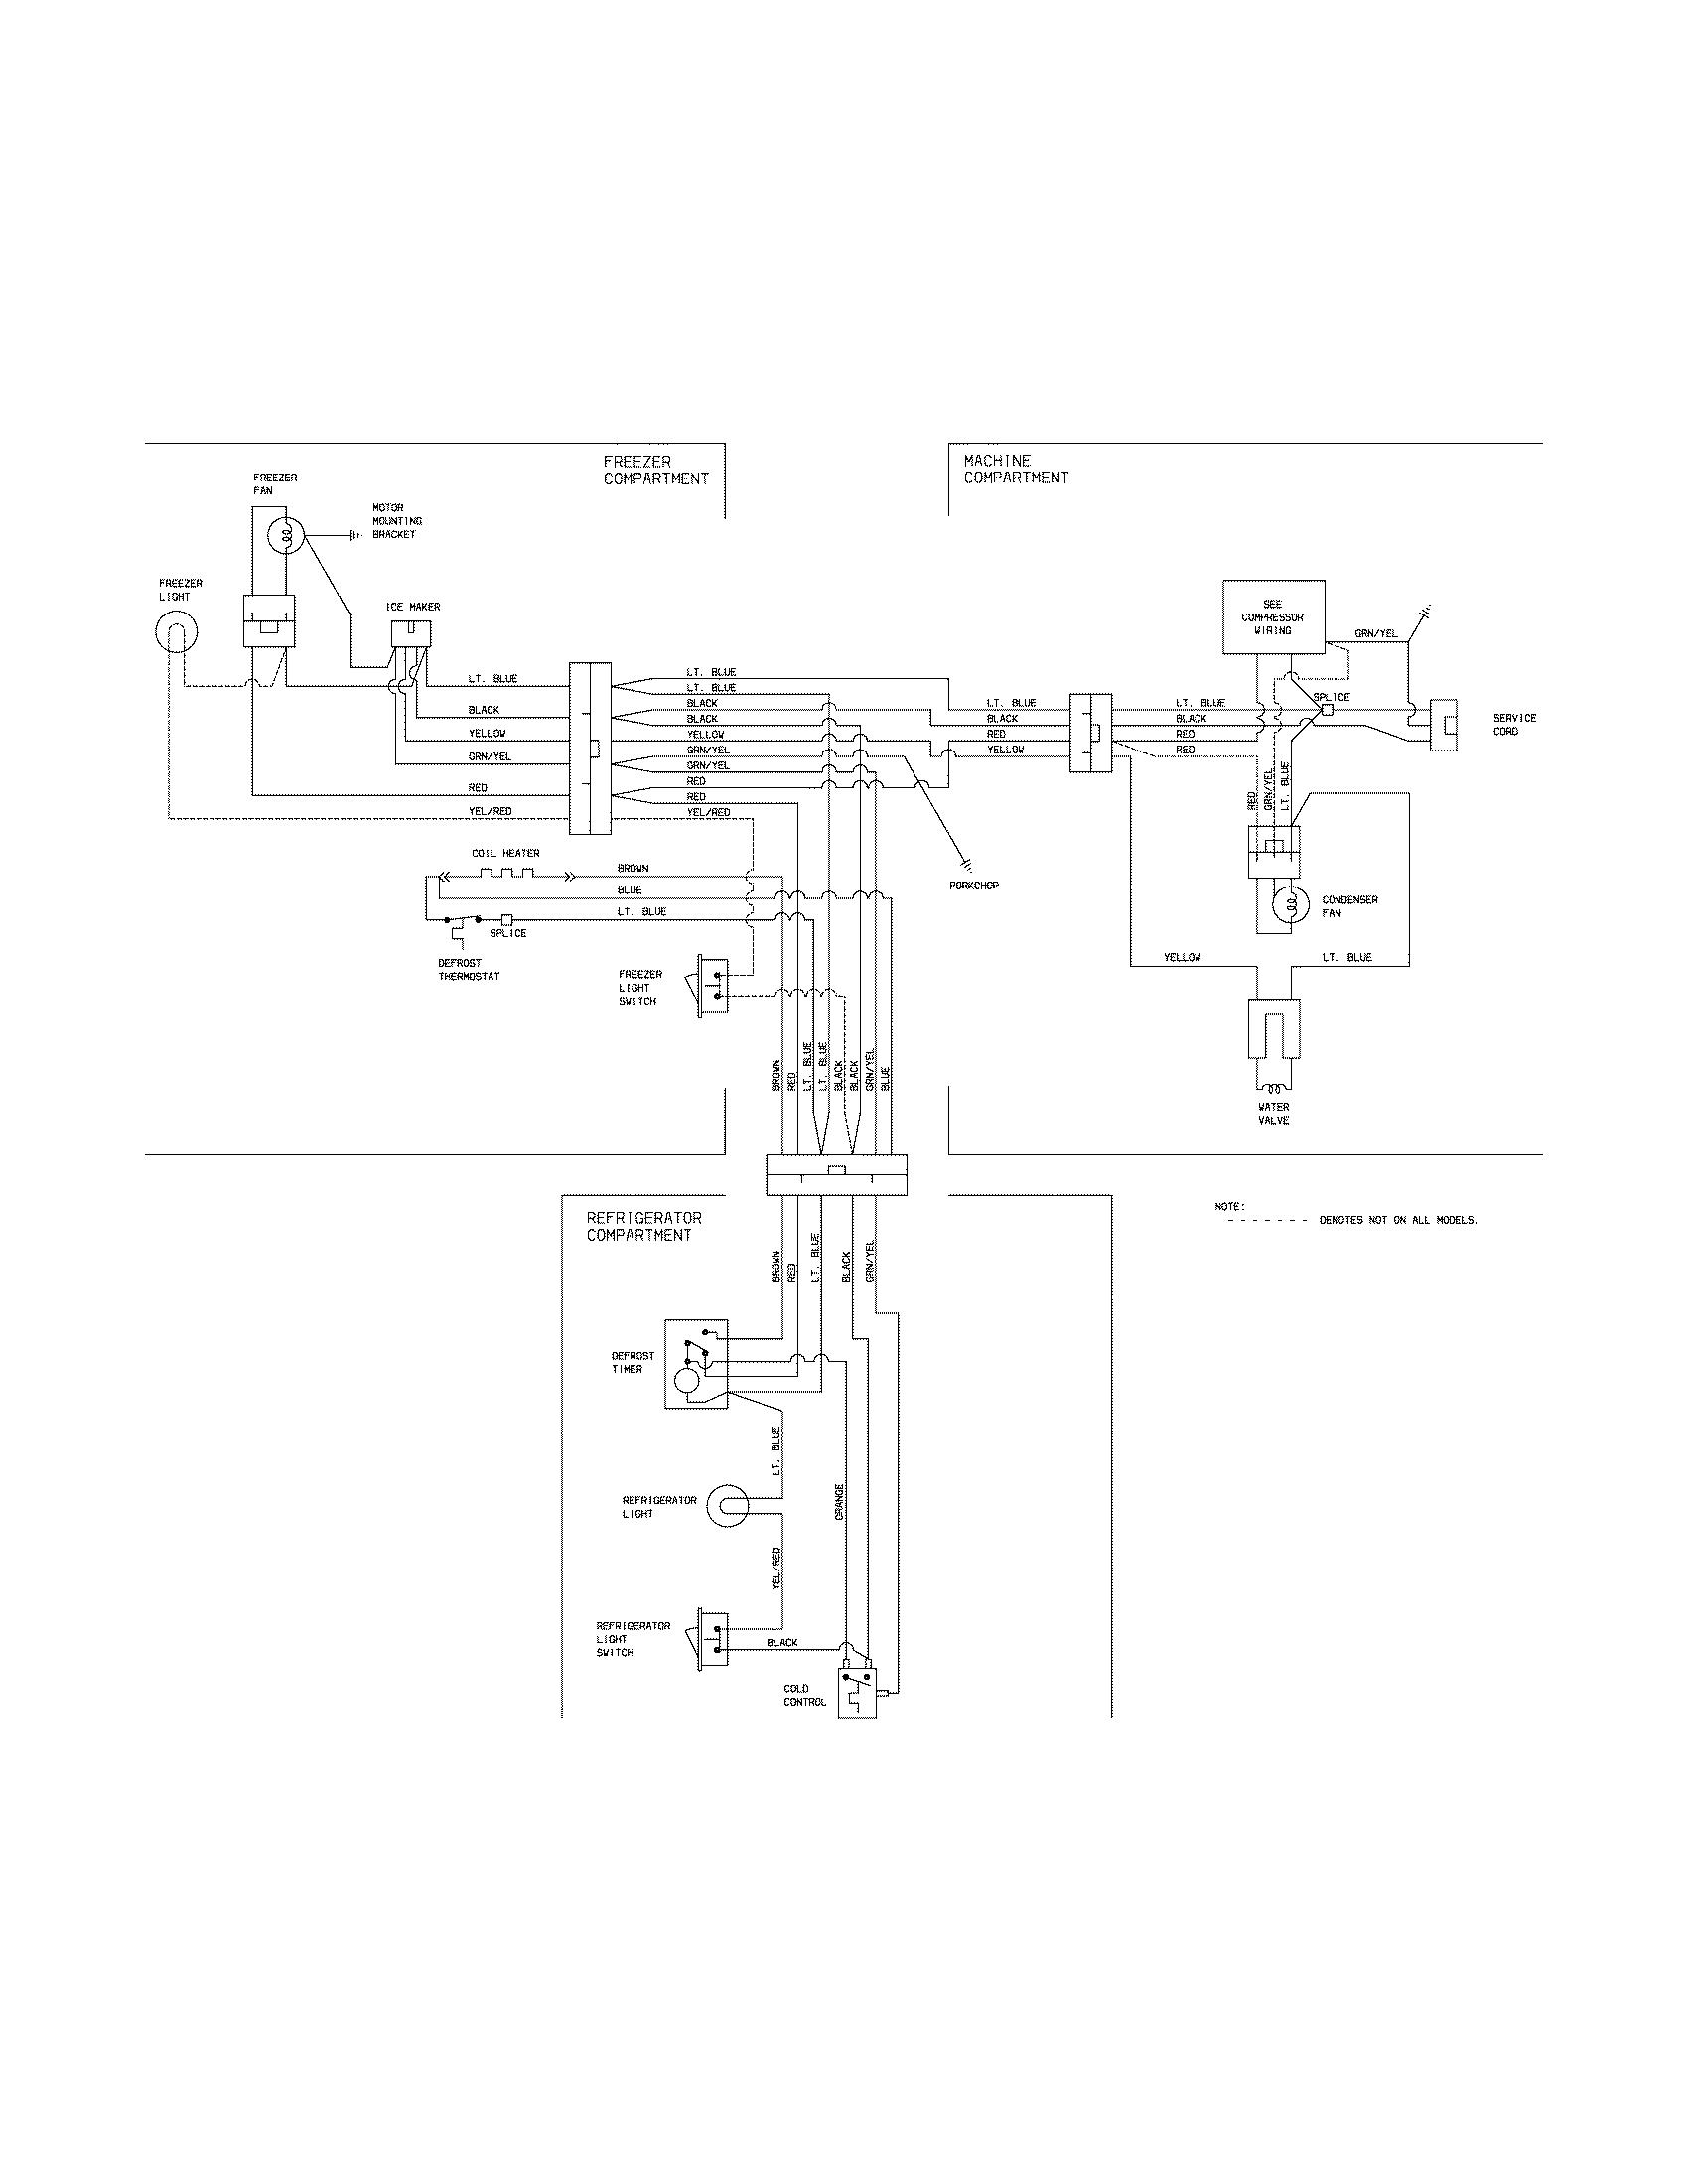 small resolution of frigidaire glrt86tek4 wiring diagram diagram